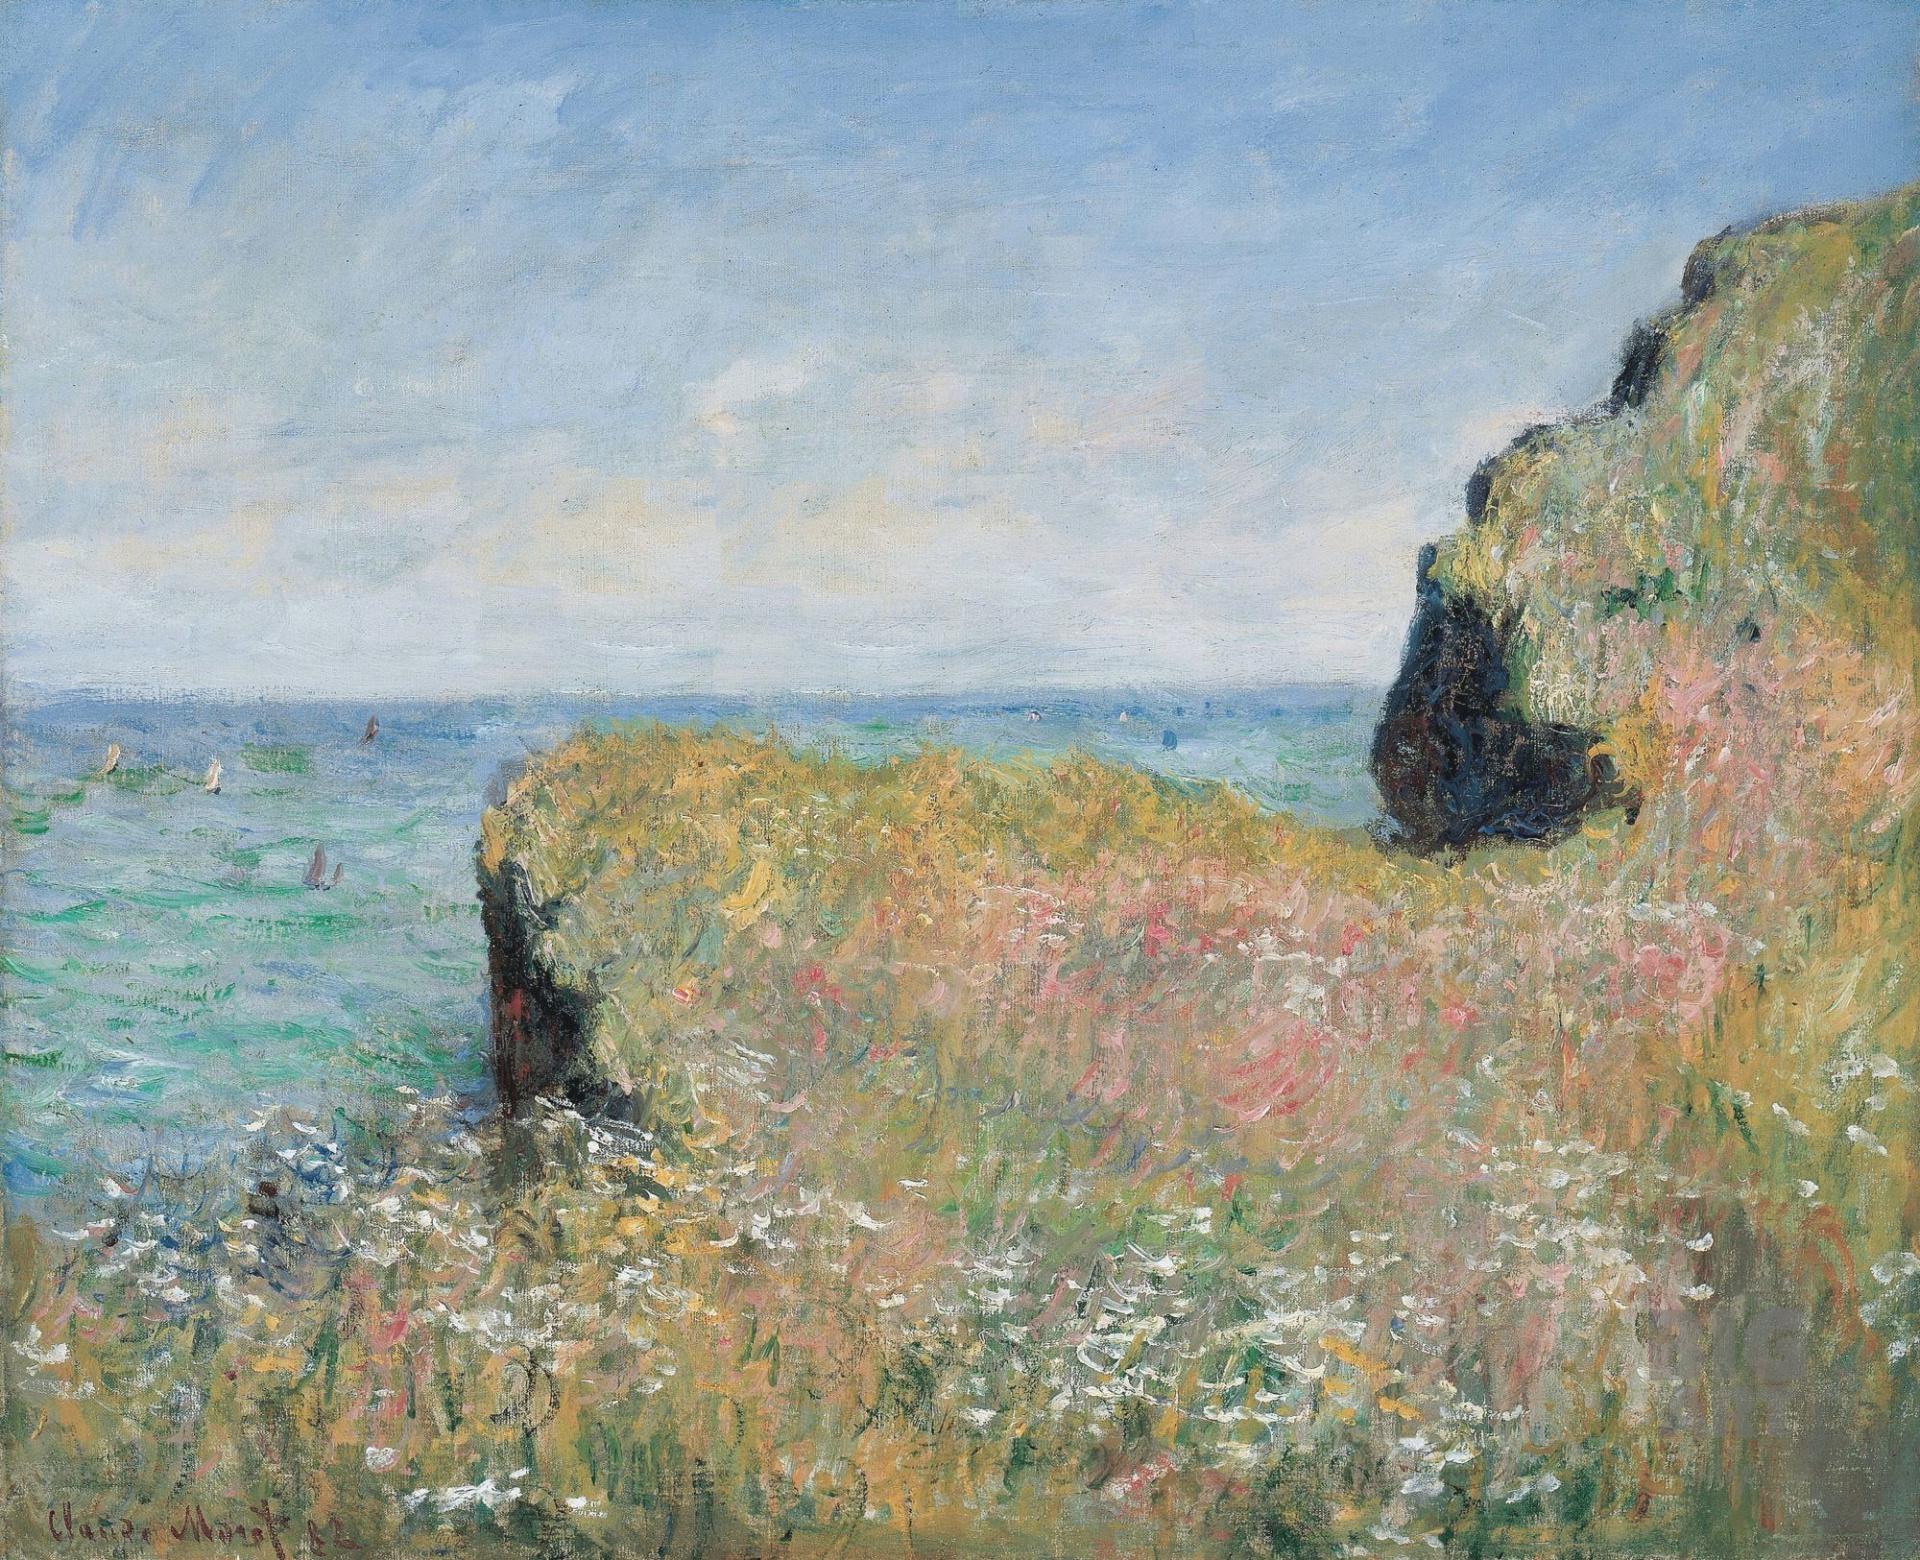 скалы и море < Край скалы, Пурвилль >:: Клод Моне, описание картины - Моне Клод (Claude Monet) фото